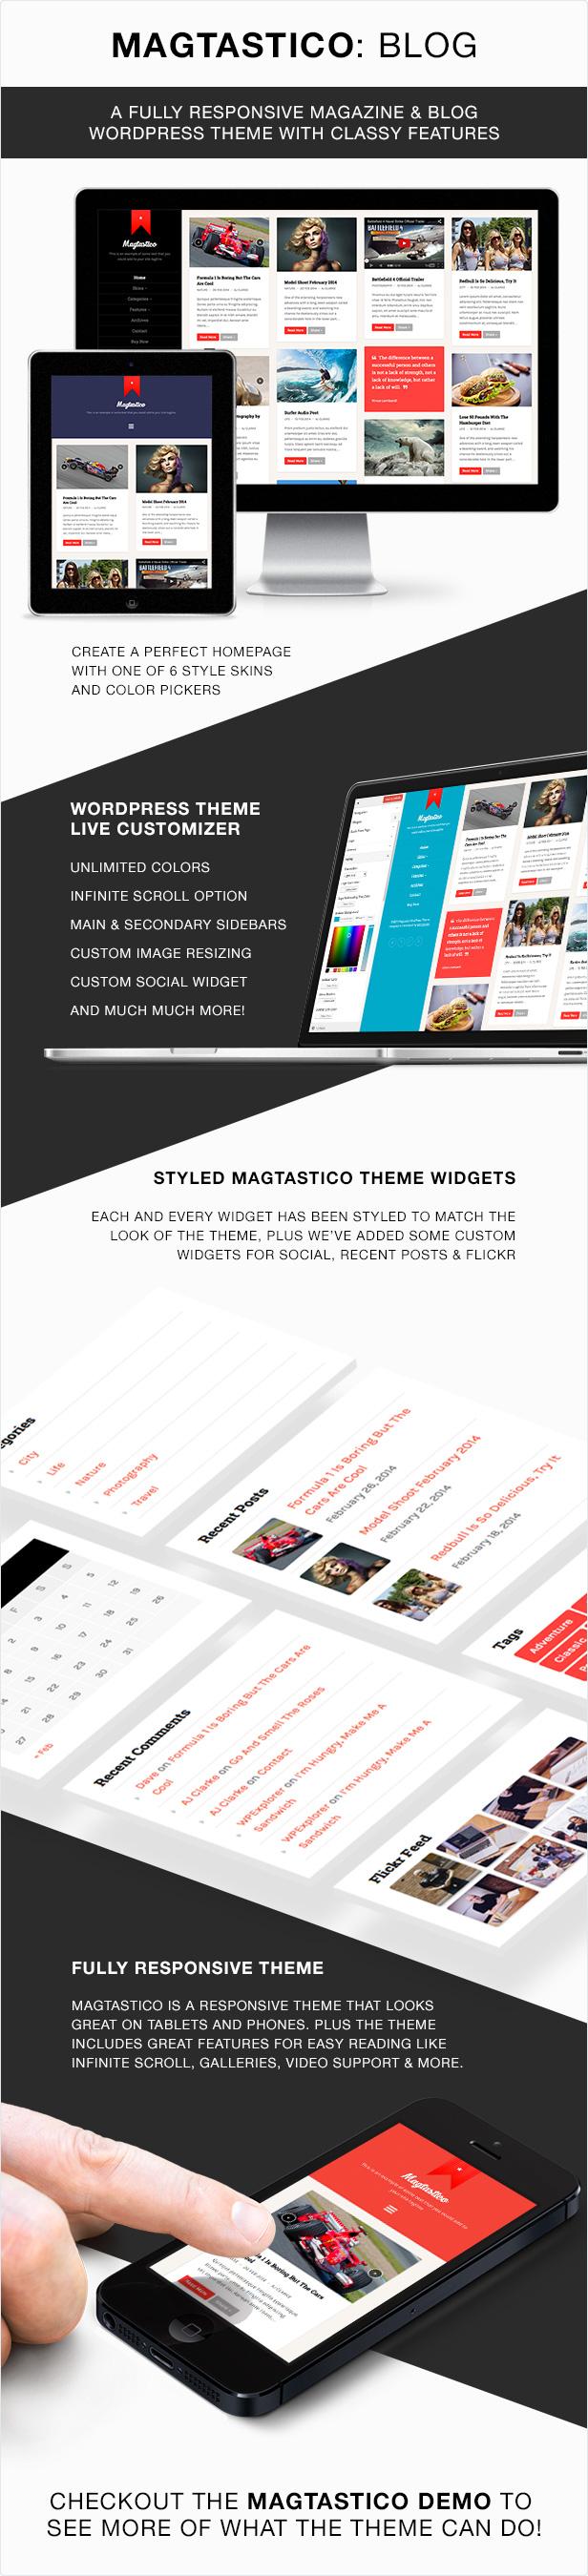 Magtastico WordPress Theme Features